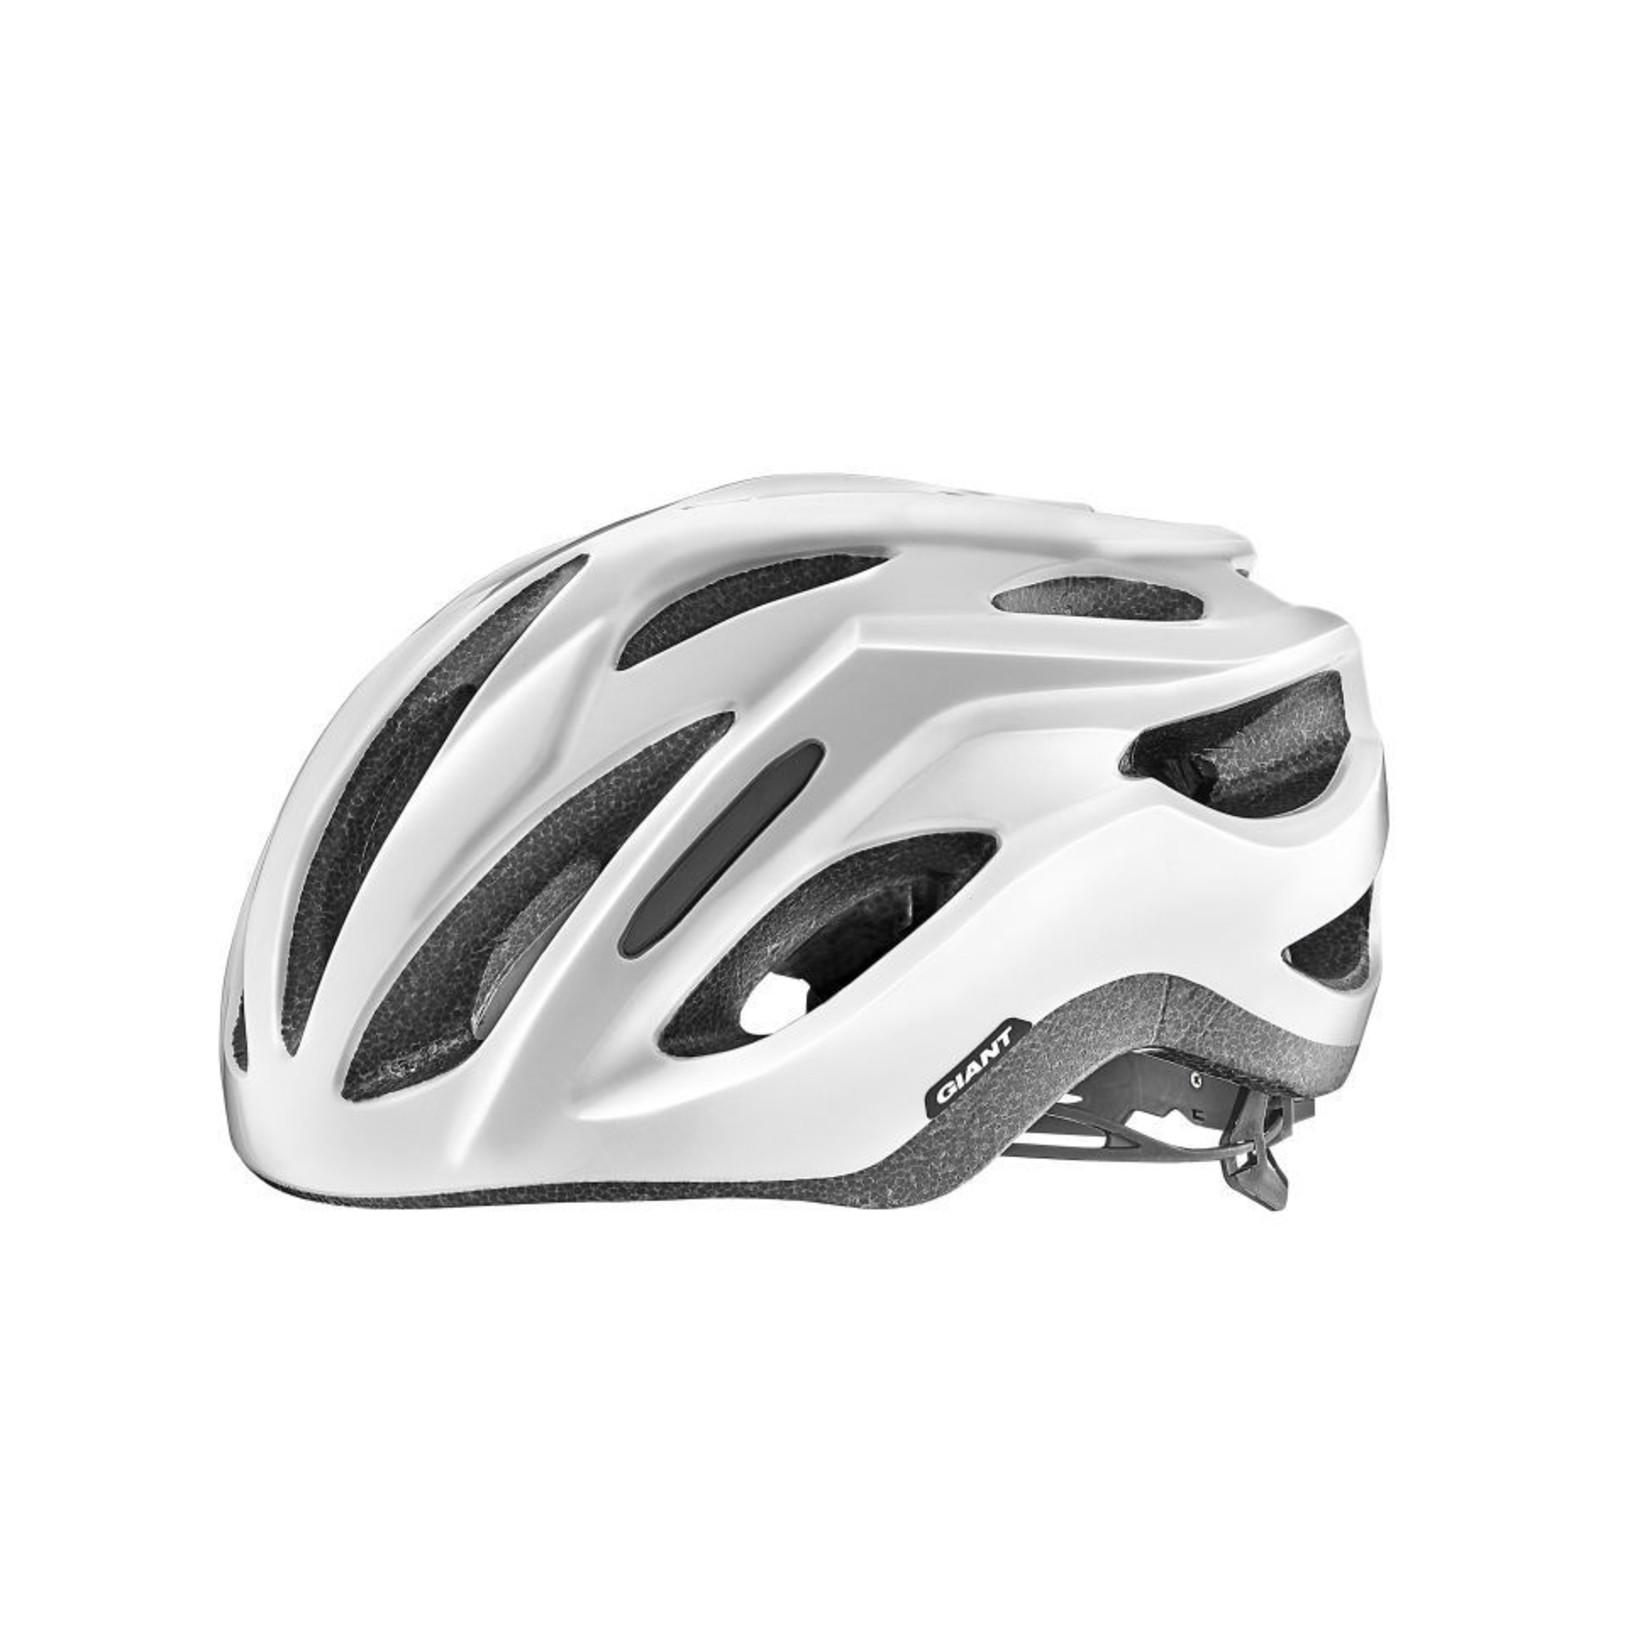 GIANT Giant Rev Comp Helmet